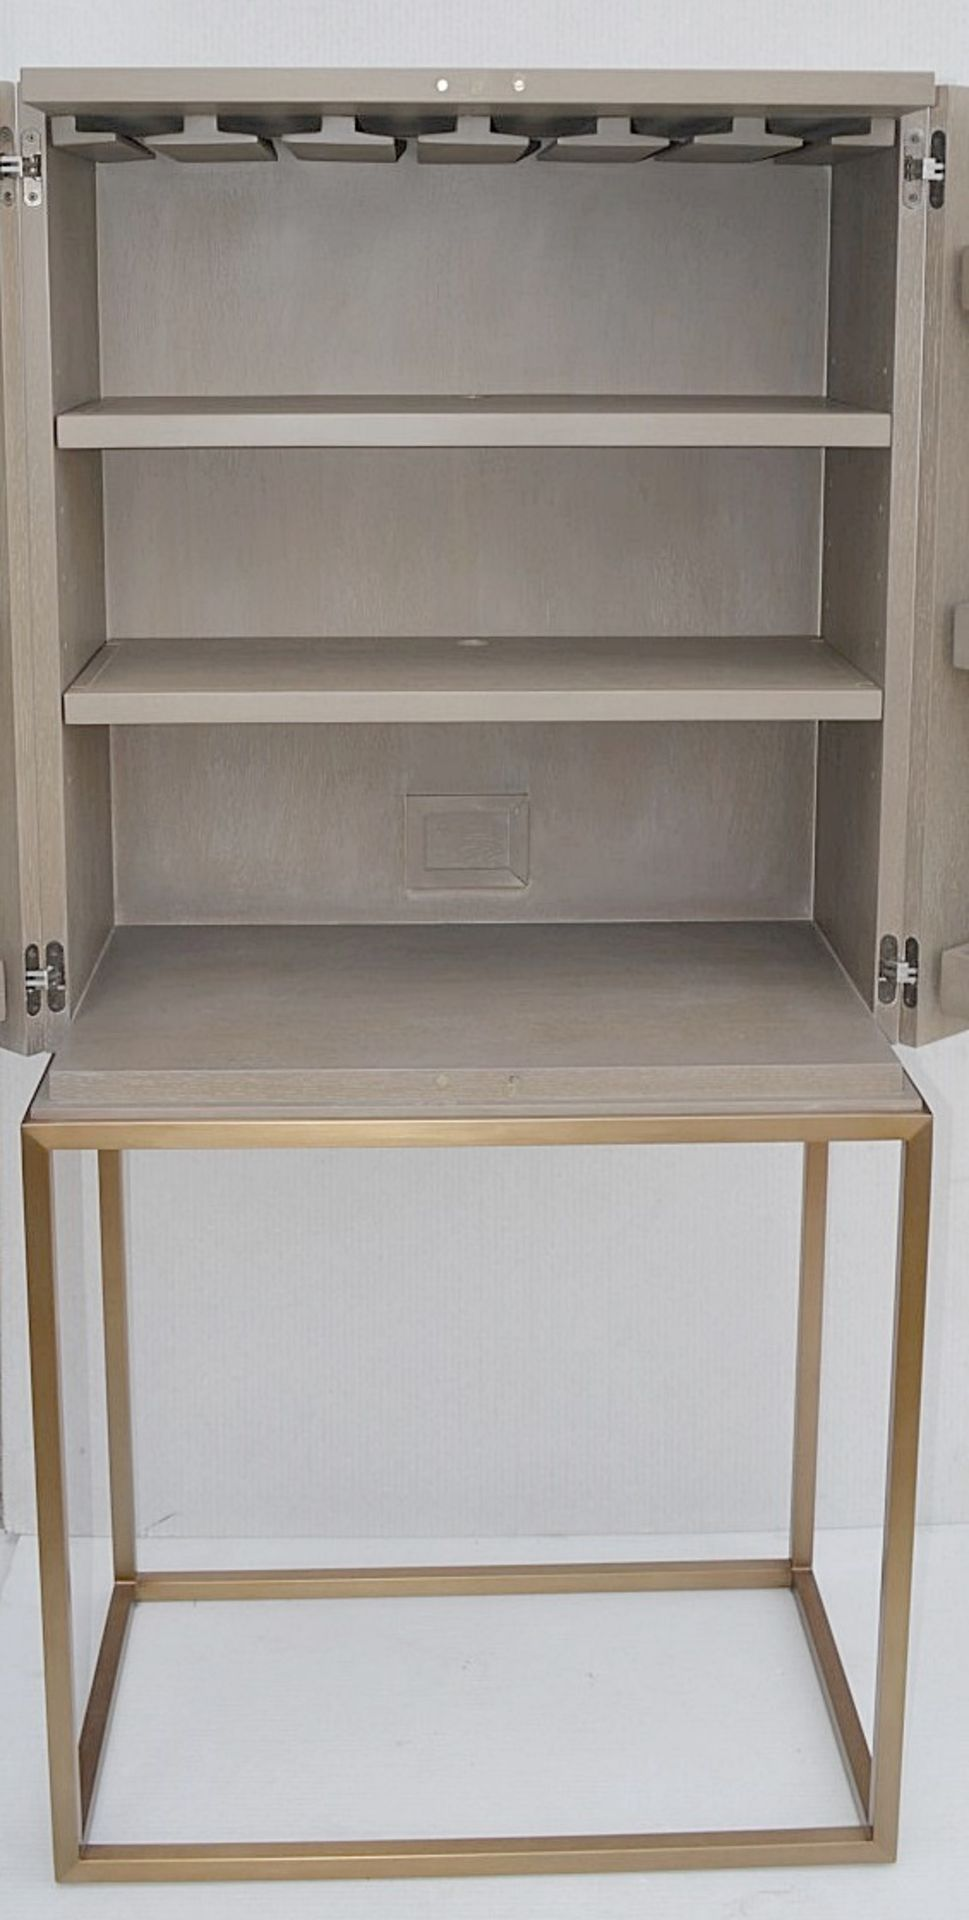 1 x EICHHOLTZ 'Delarenta' Wine Cabinet In Washed Oak And Brass - Original RRP £3,289 - Image 7 of 11